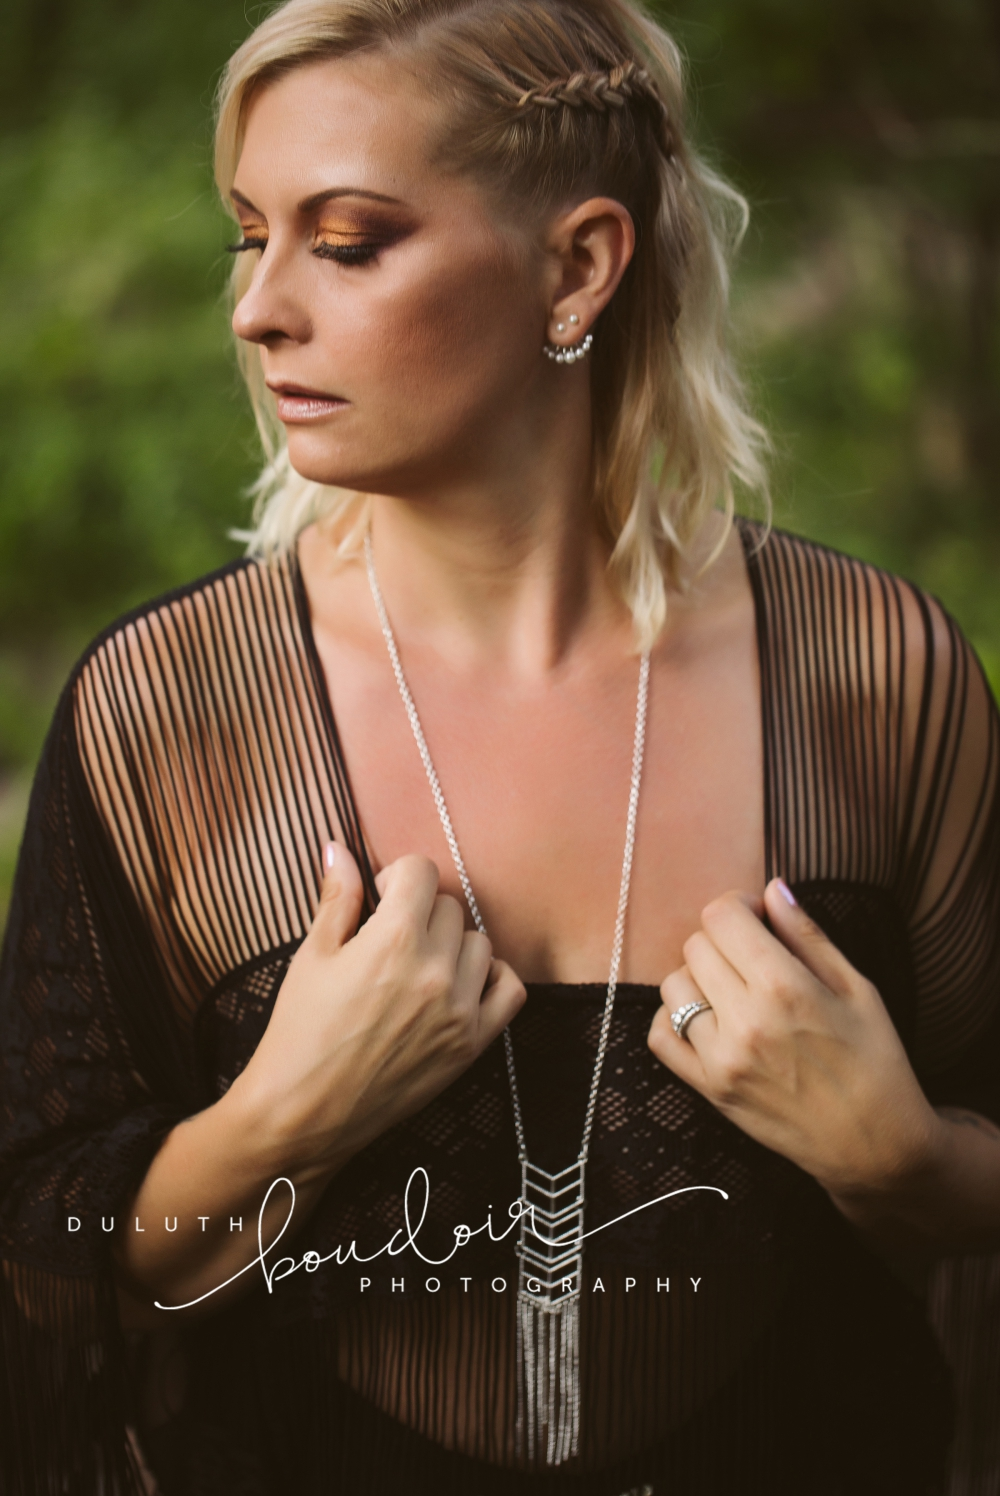 duluth-boudoir-photography-andrea-16